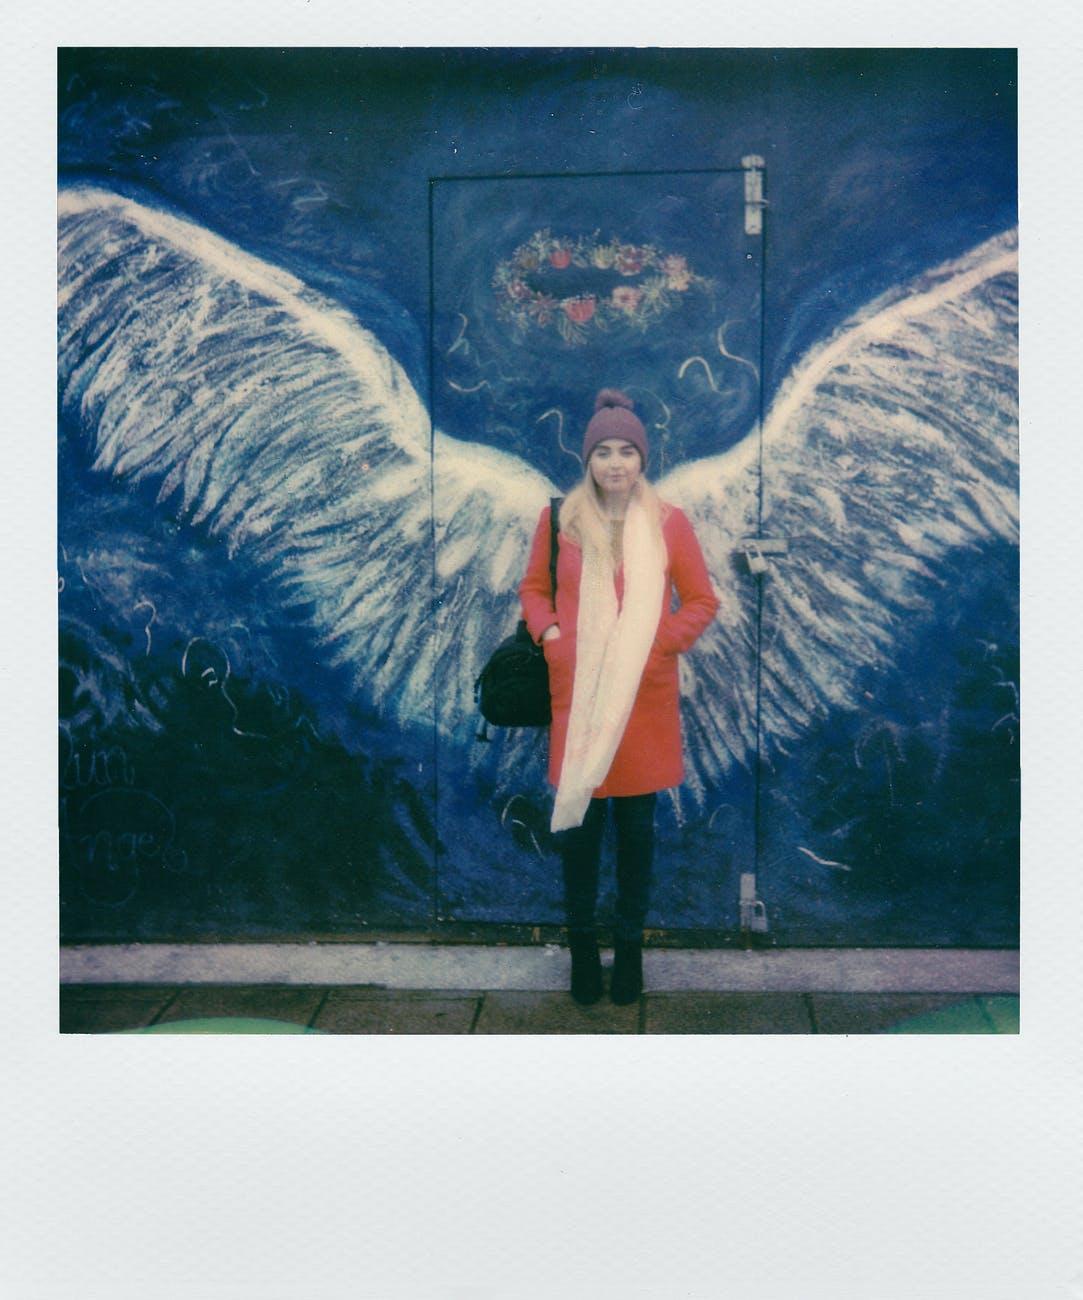 woman in orange coat standing in front of angel wings